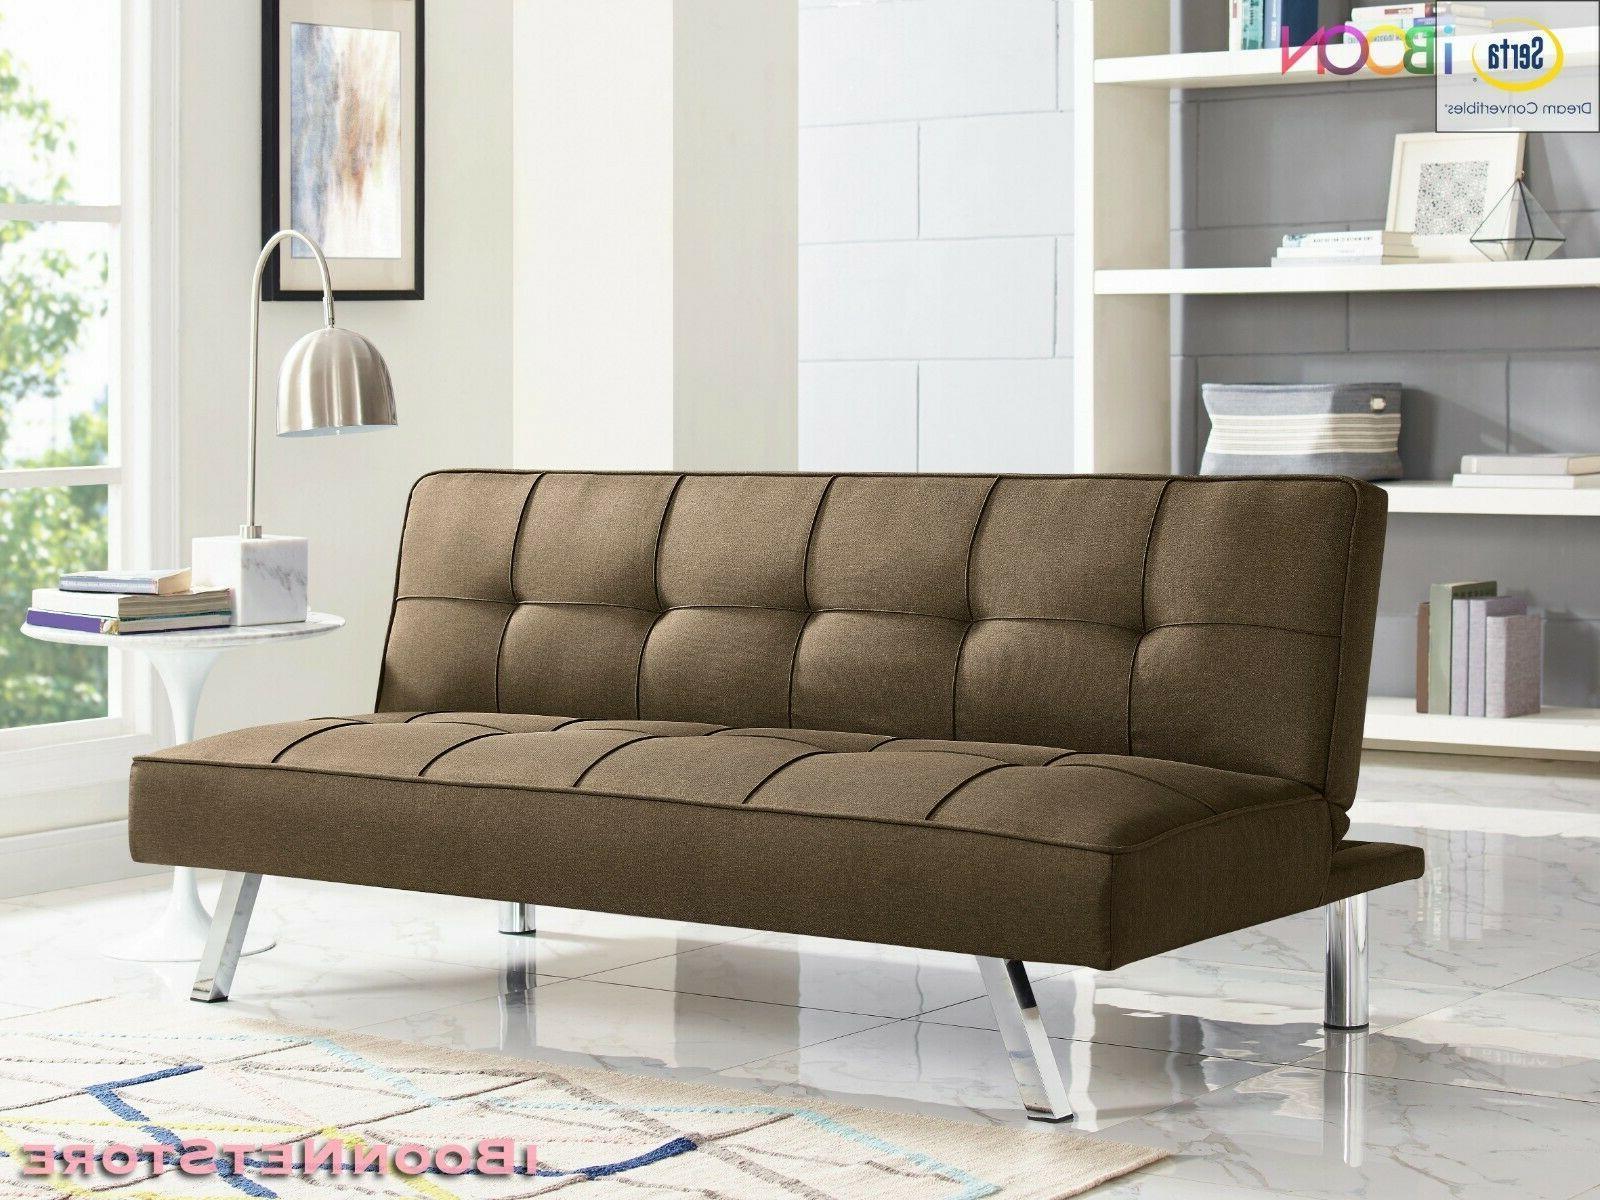 Futon Sofa Sleeper Foldable Size With Mattress